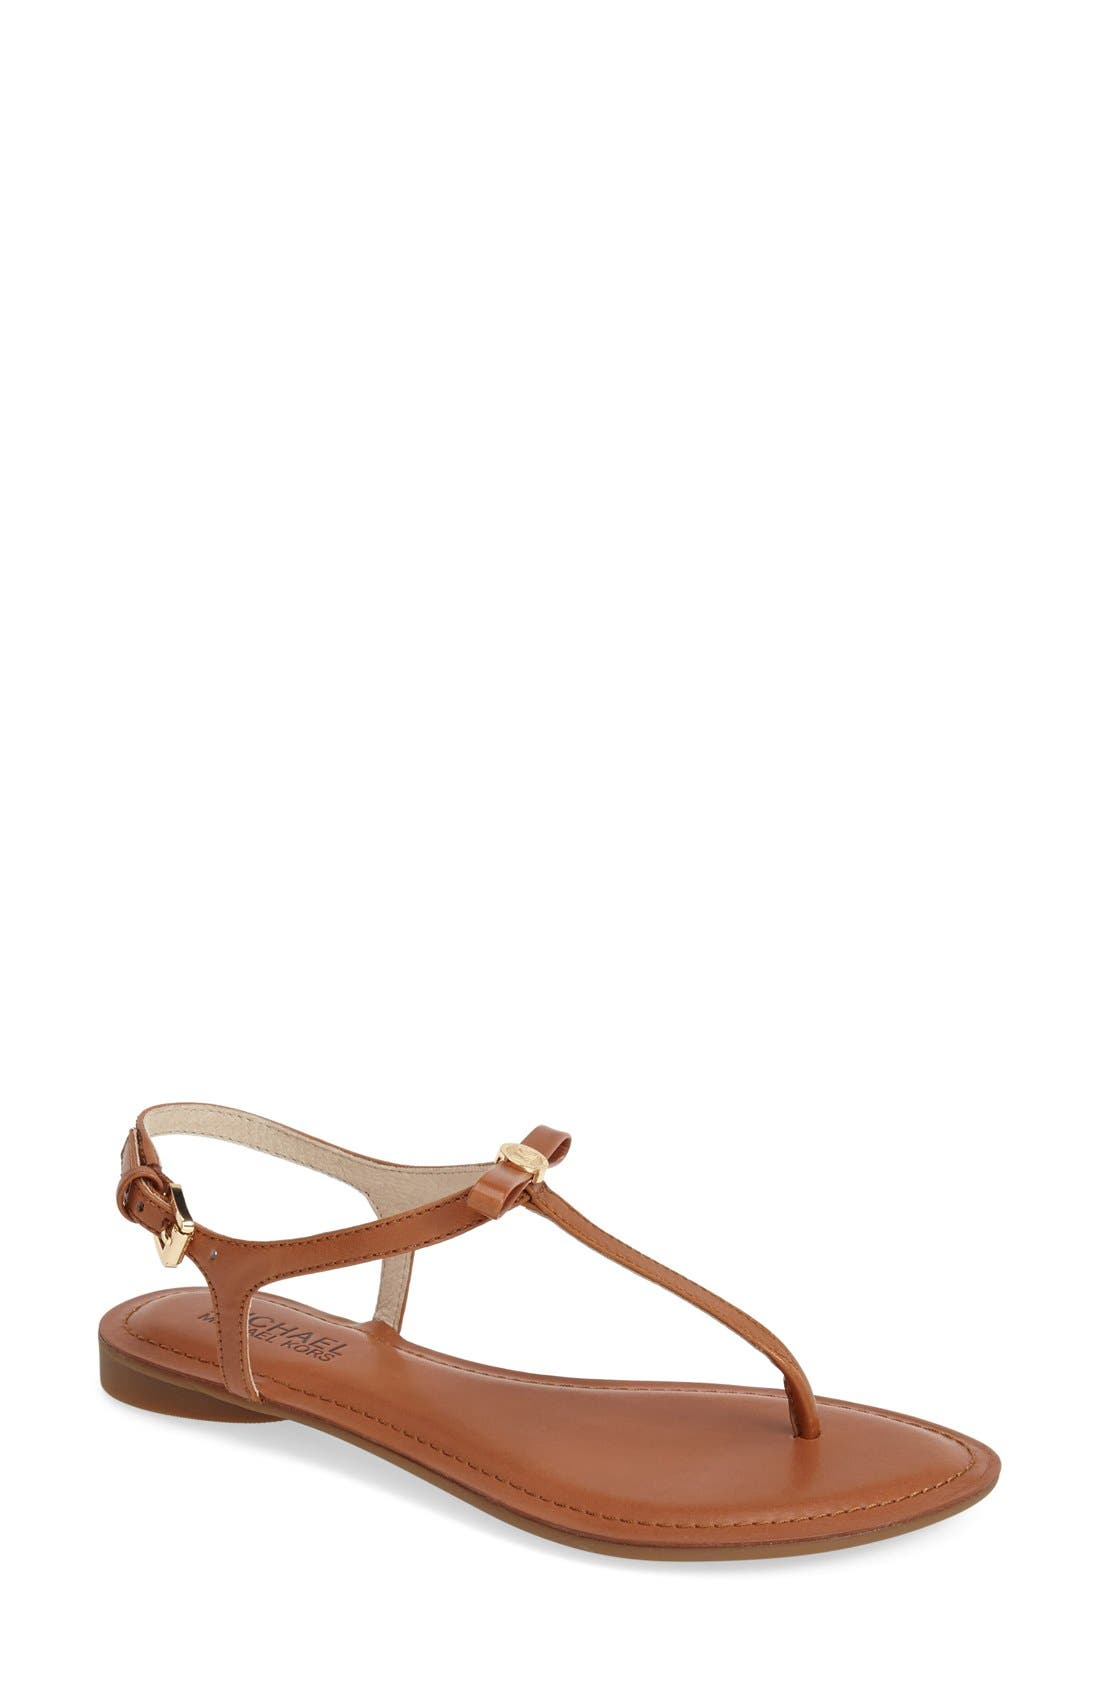 Alternate Image 1 Selected - MICHAEL Michael Kors 'Josie' T-Strap Leather Sandal (Women)